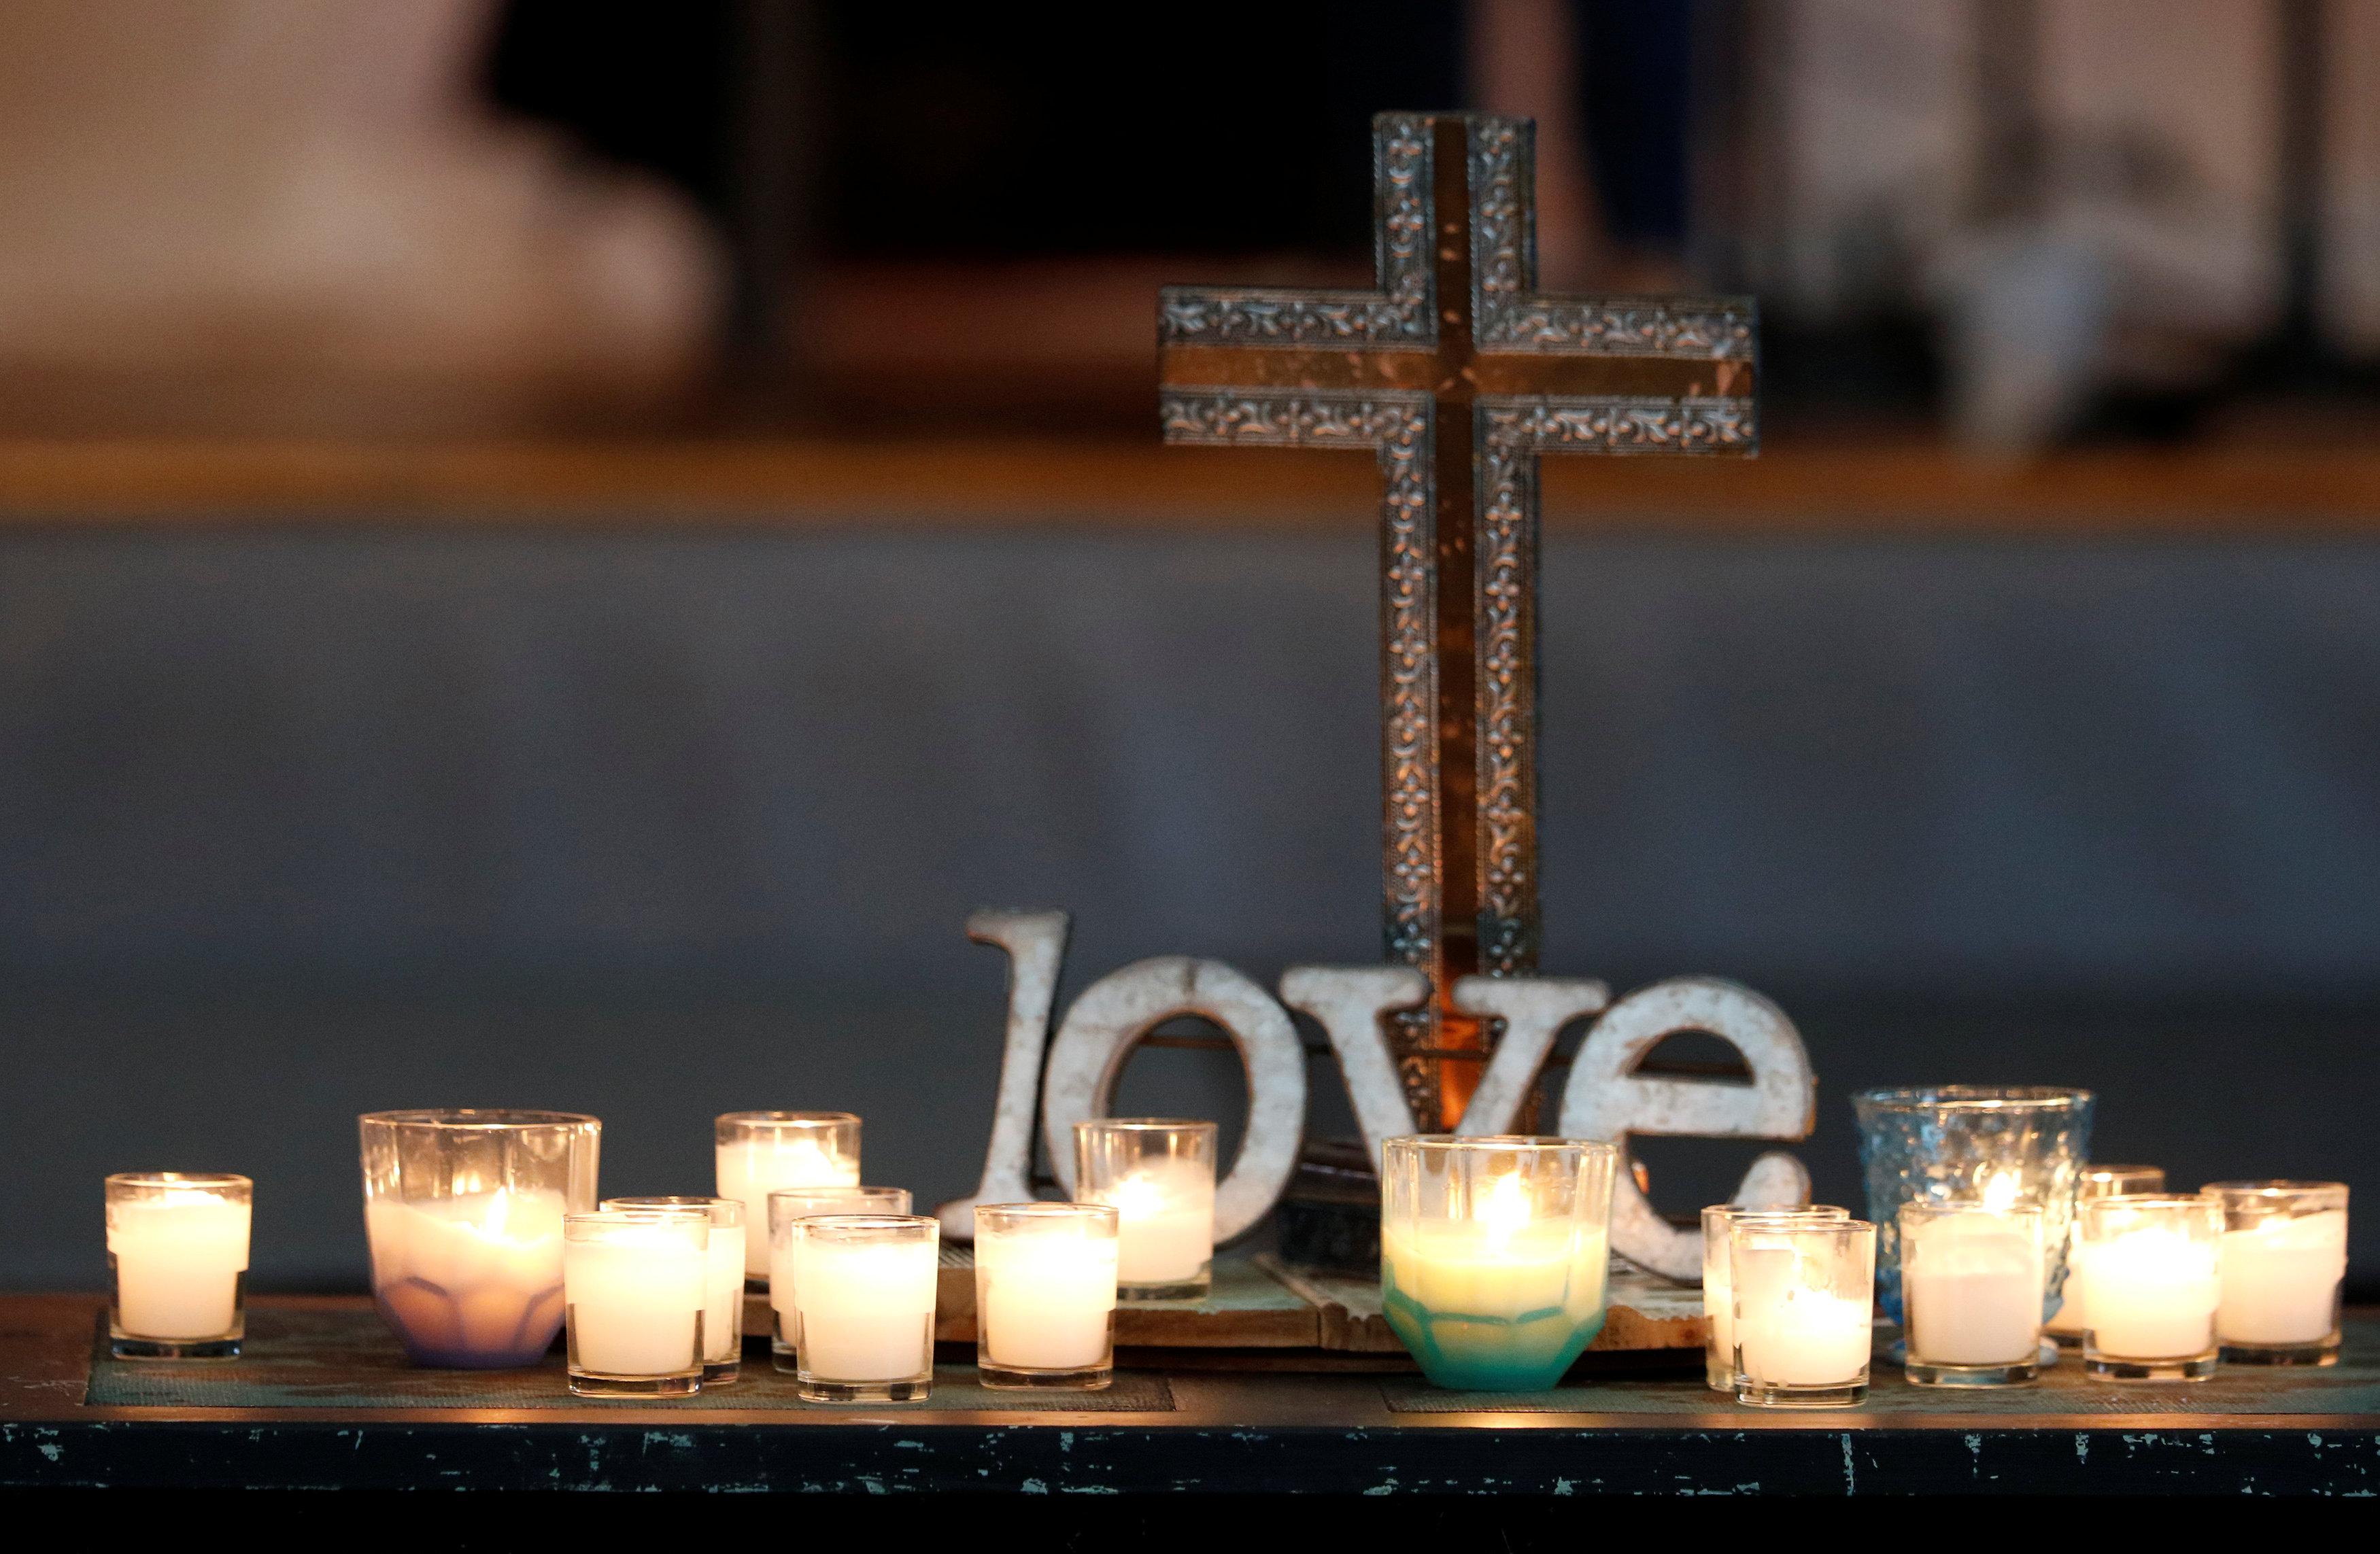 Christ Church Shootings Twitter: Students Plan Protests, Washington March, To Demand Gun